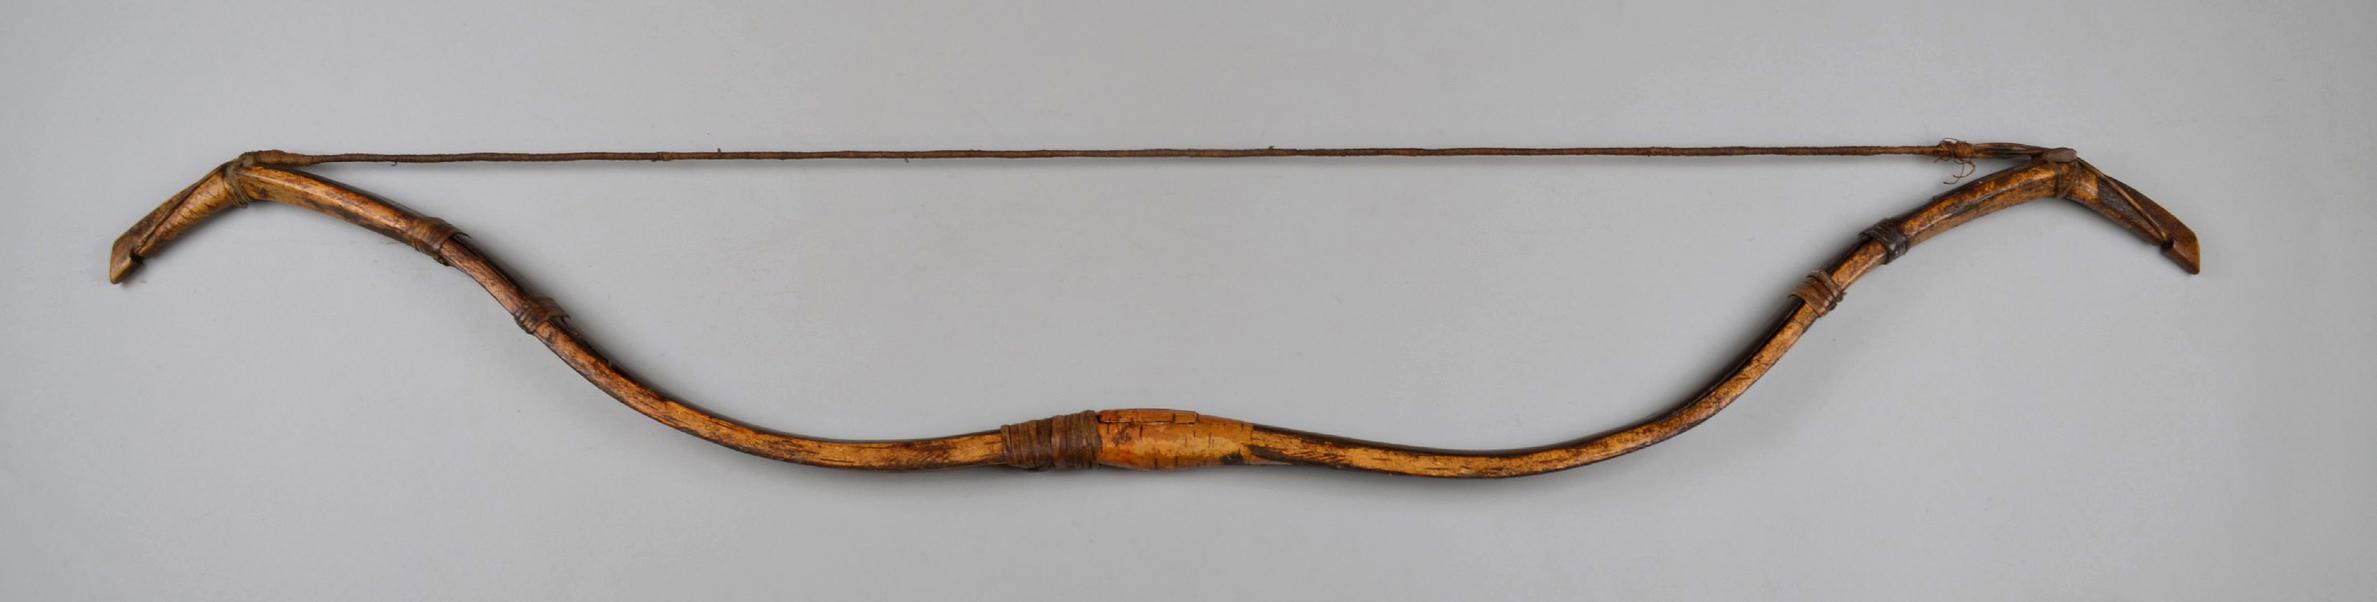 Bashkir bow from British Museum, presumably 19th century.